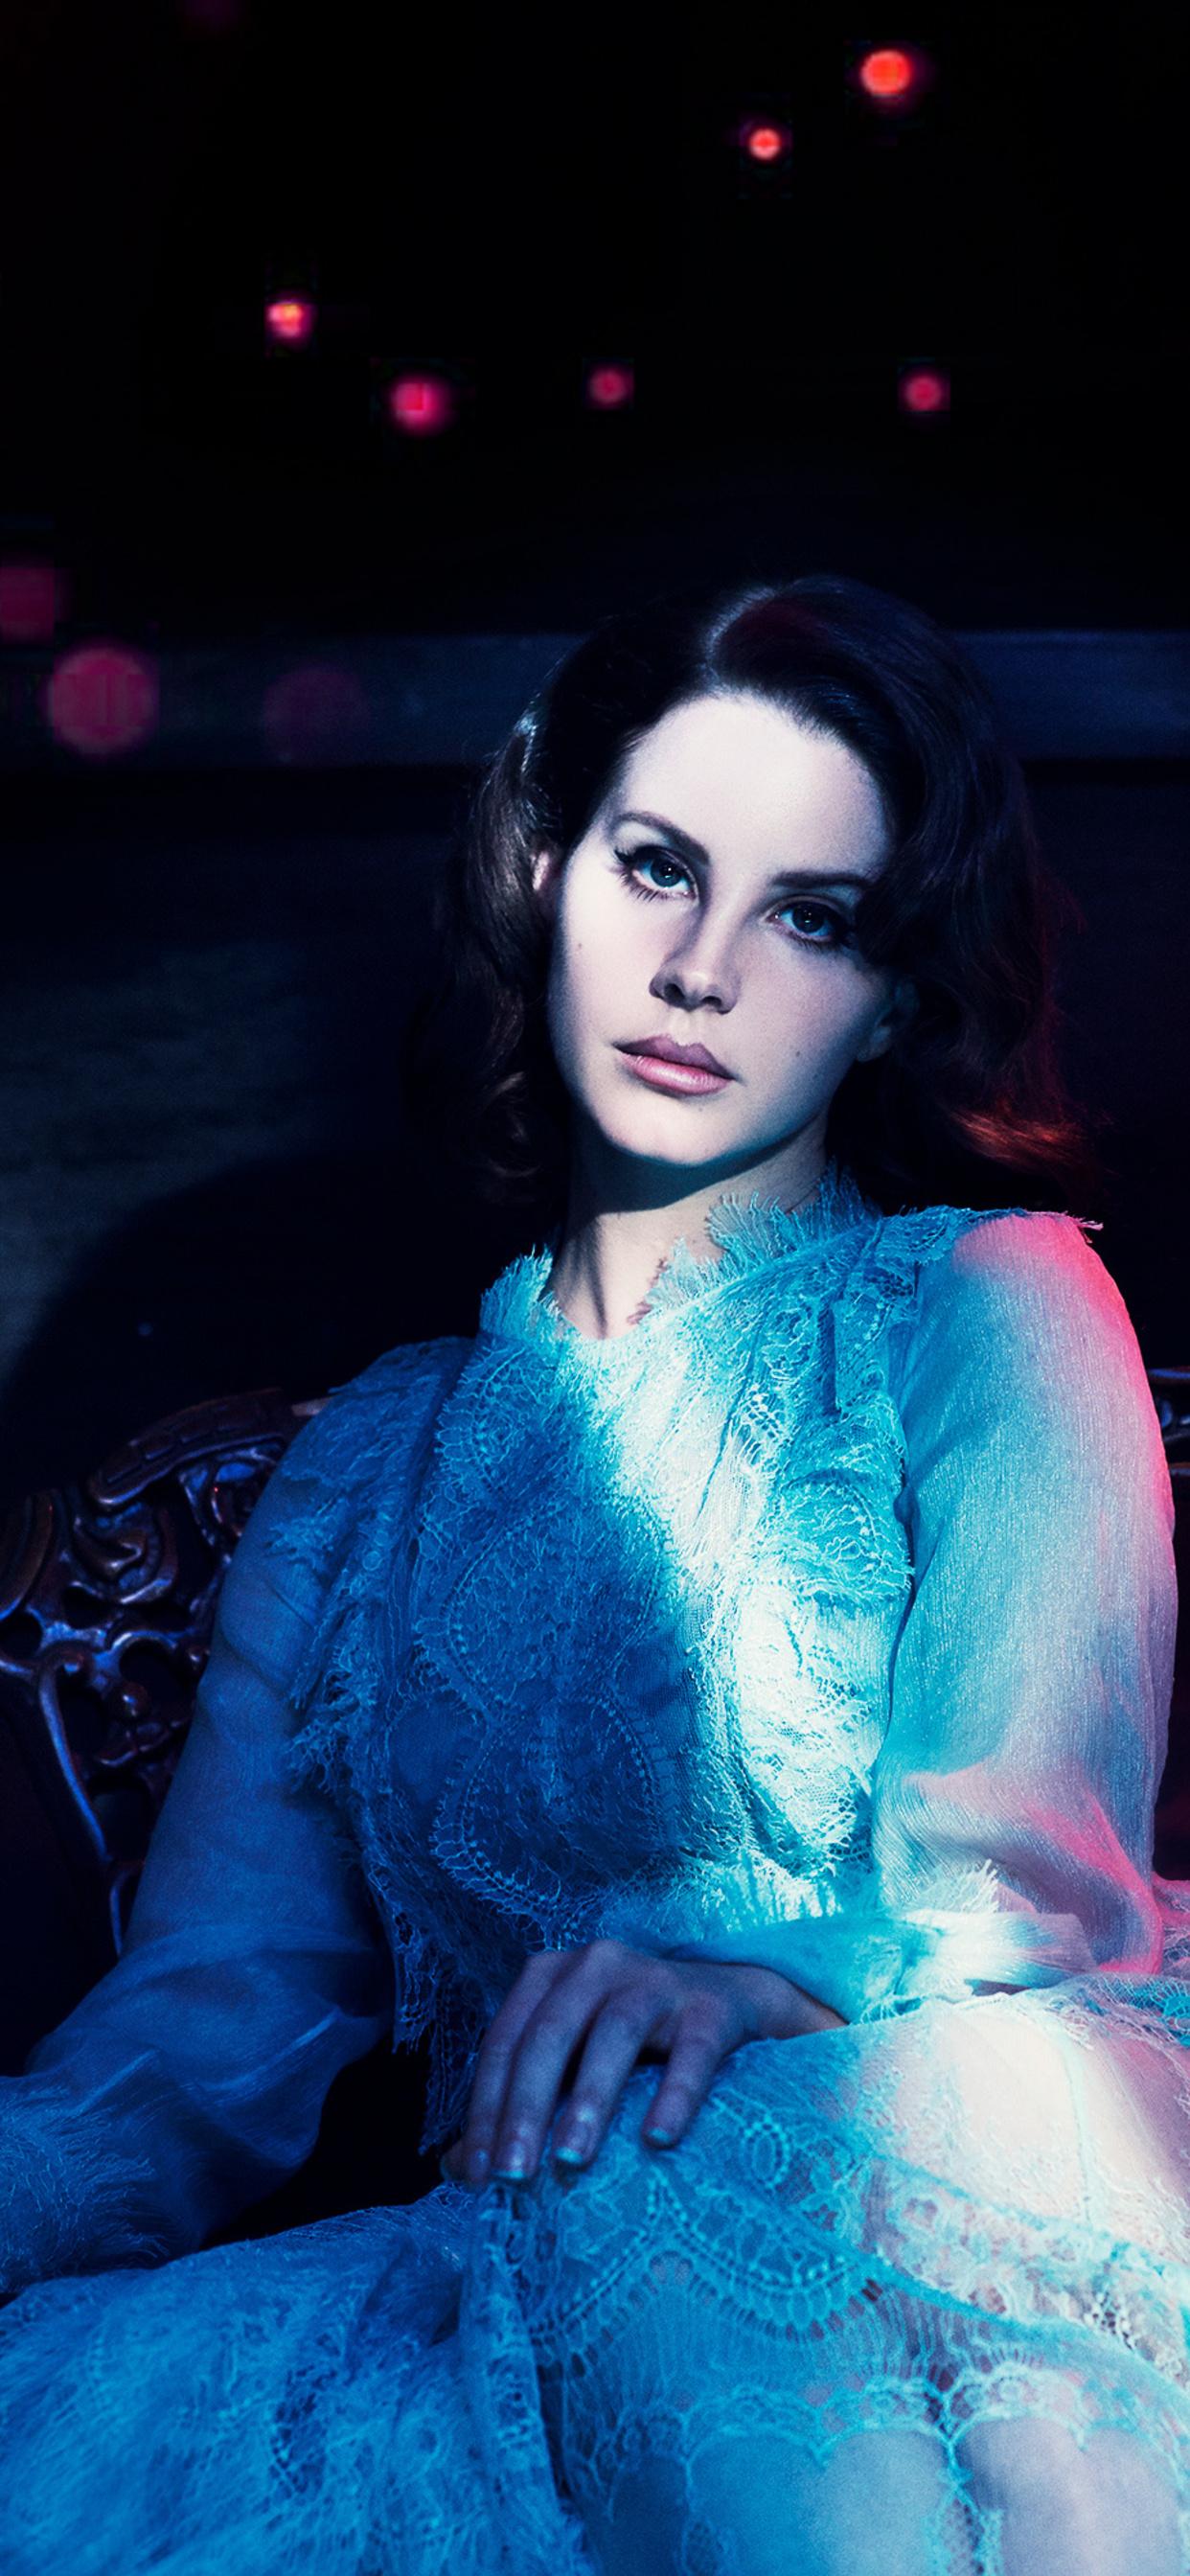 1242x2688 Lana Del Rey Complex Magazine Photoshoot Iphone Xs Max Hd